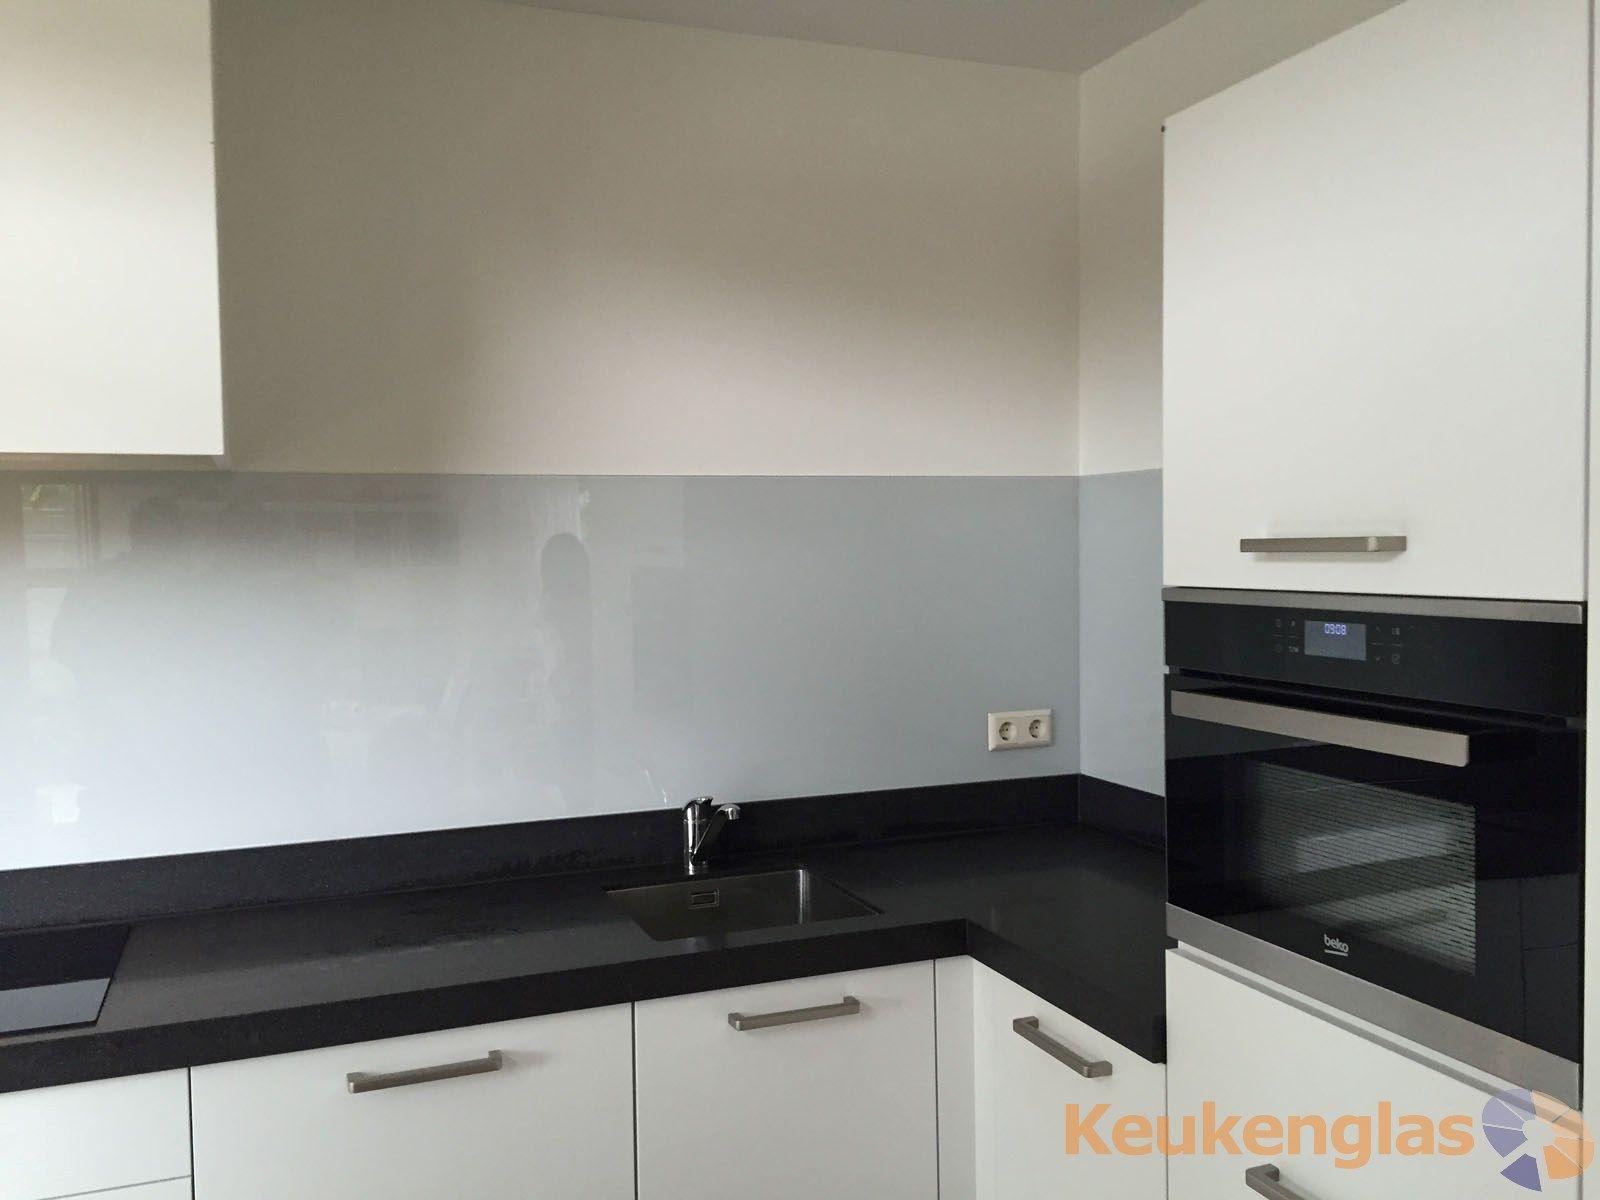 Keuken Design Nieuwegein : Lichtgrijze keuken achterwand in nieuwegein keukenglas